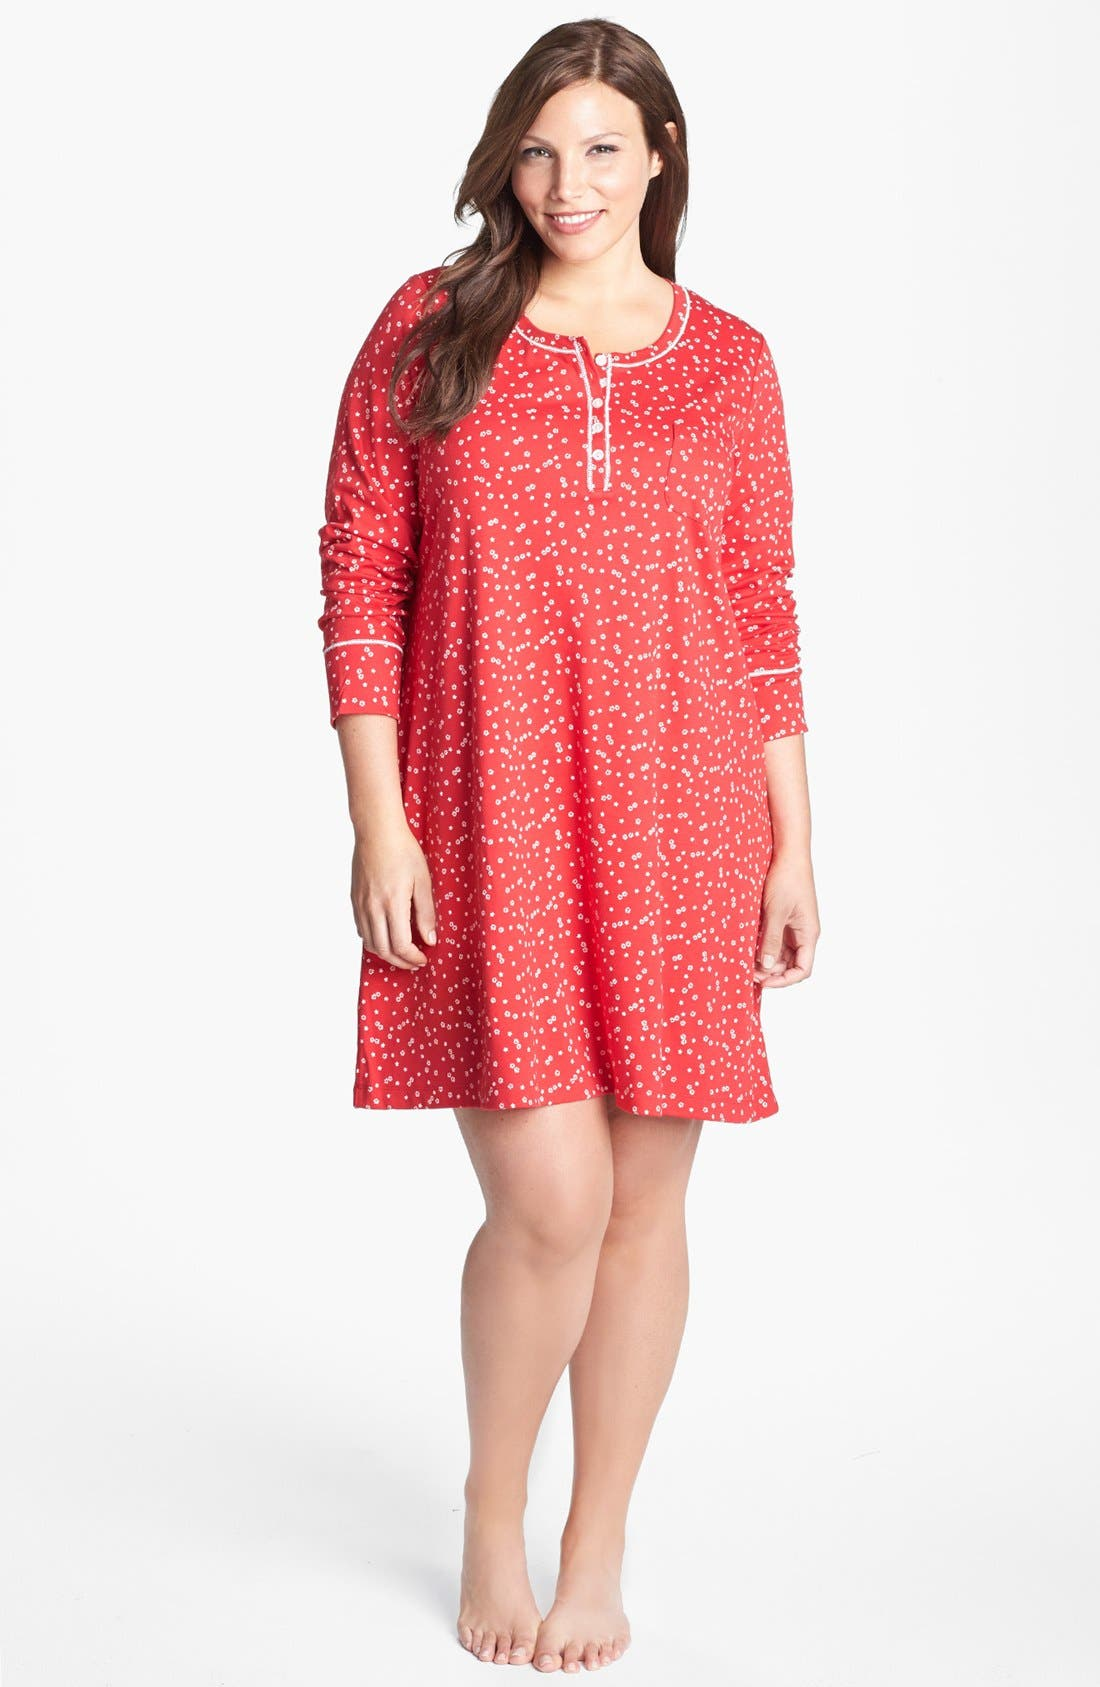 Main Image - Carole Hochman Designs Knit Sleep Shirt (Plus Size)